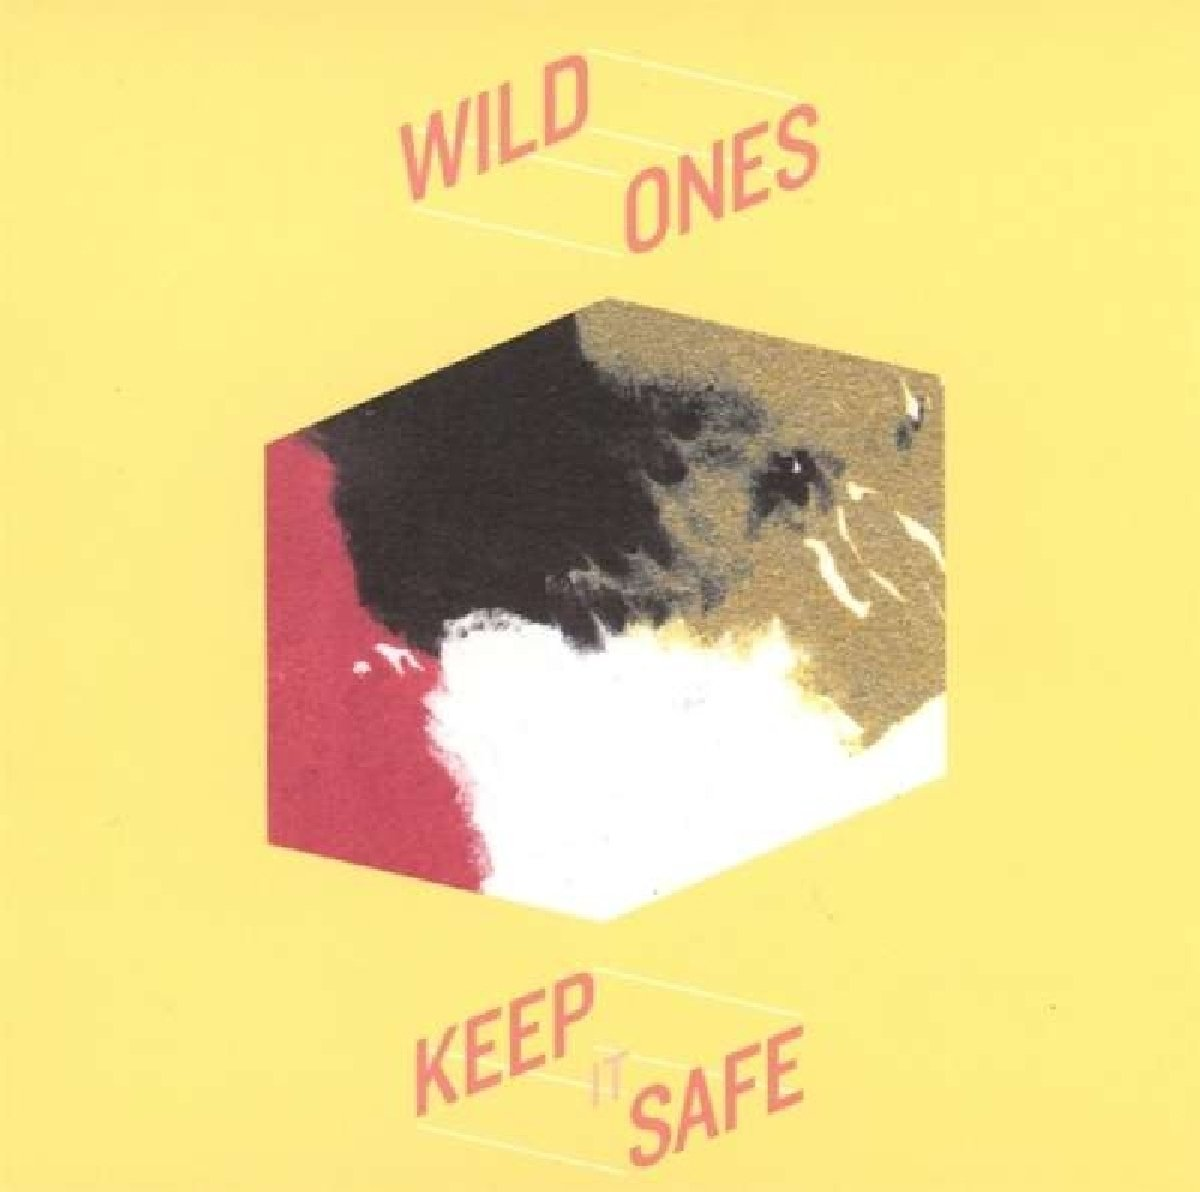 CD : Wild Ones - Keep It Safe (Digipack Packaging)